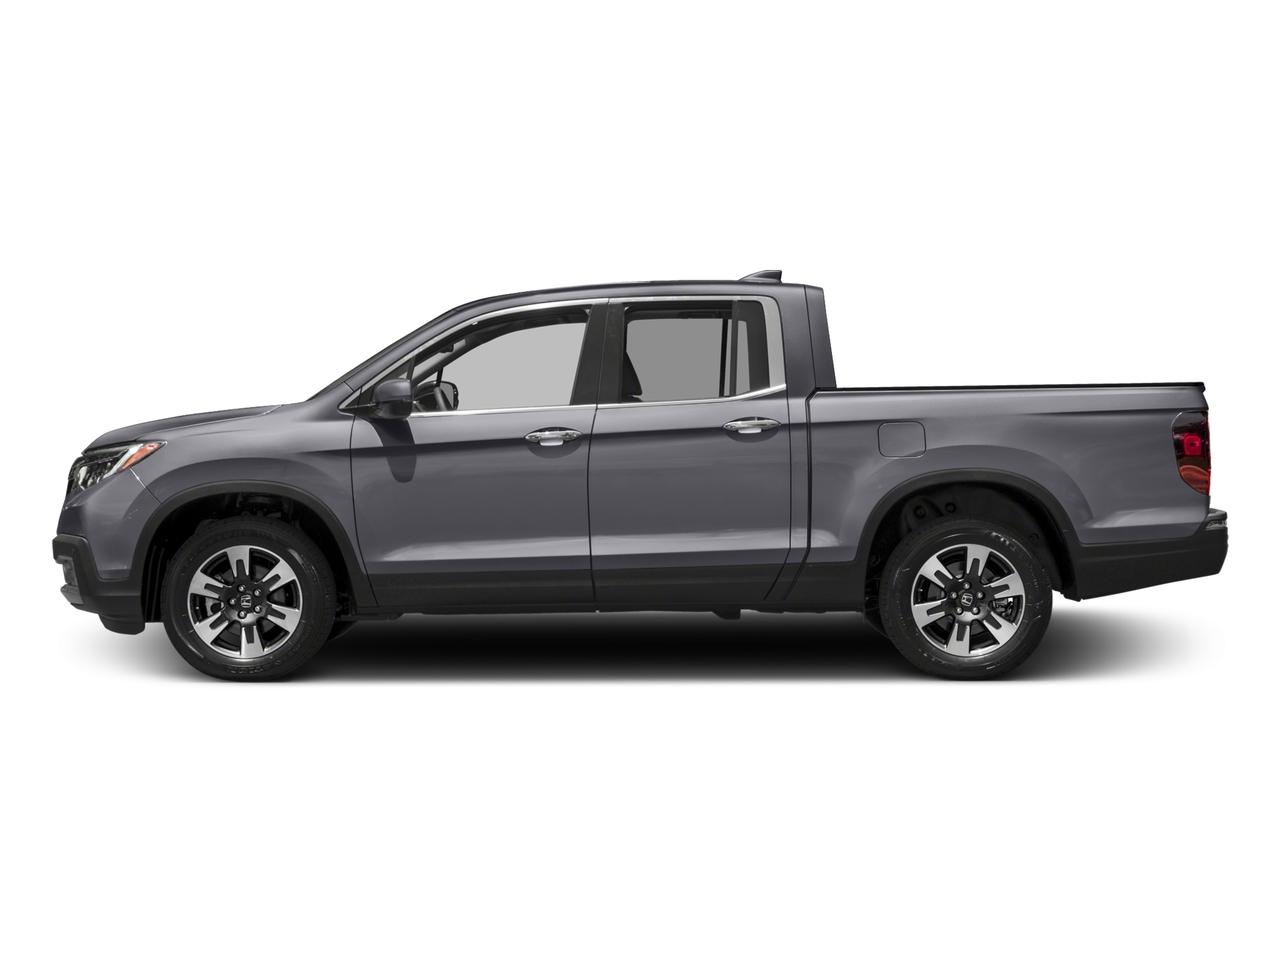 2017 Honda Ridgeline New Truck Deals Springfield Mo